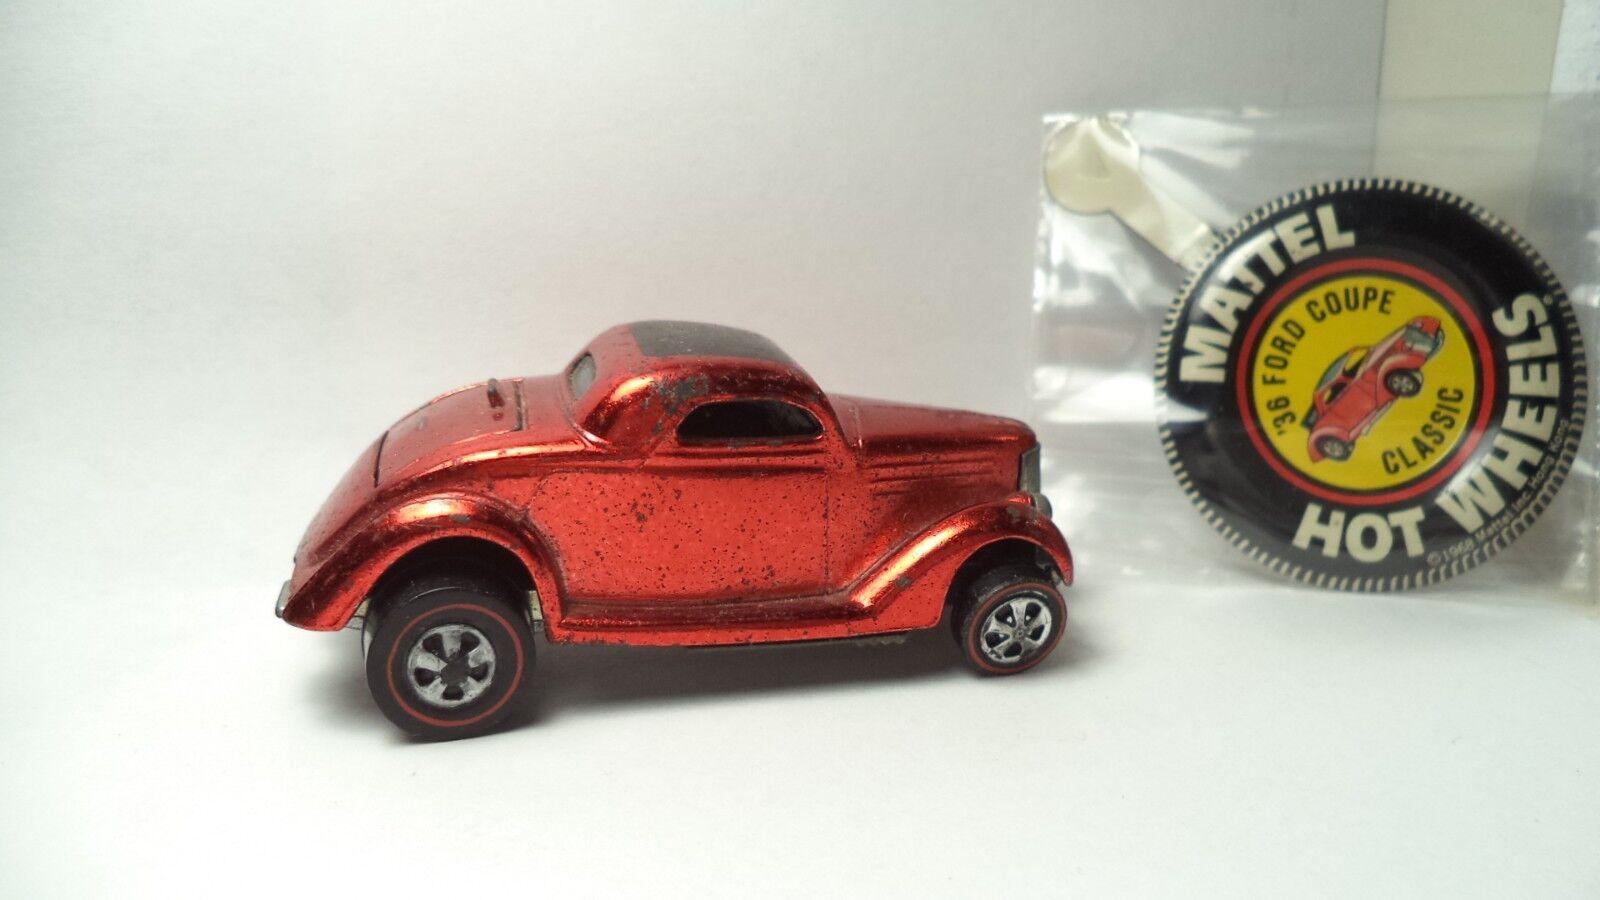 Vintage Hot Wheels rosso líneas USA 1969 Classic'36 Ford Coupe [cobre] con botón